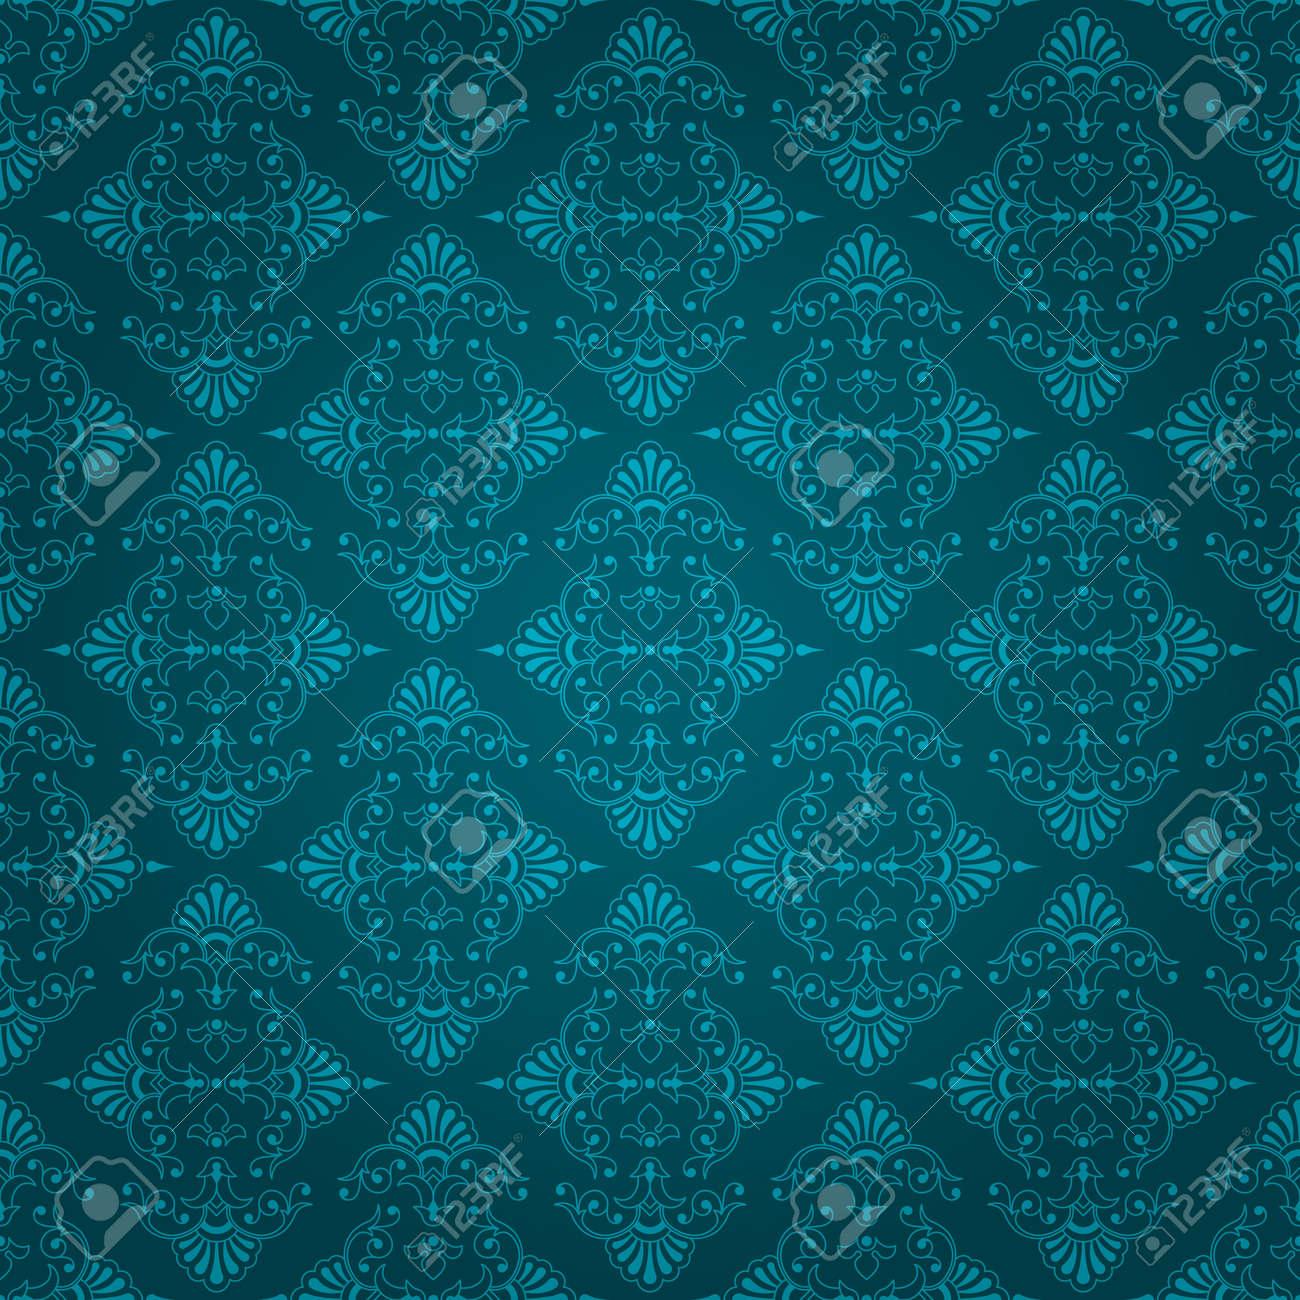 Good Wallpaper Dark Teal - 17981869-beautiful-dark-bluey-green-seamless-vintage-wallpaper-design-with-floral-element  HD_621641 .jpg